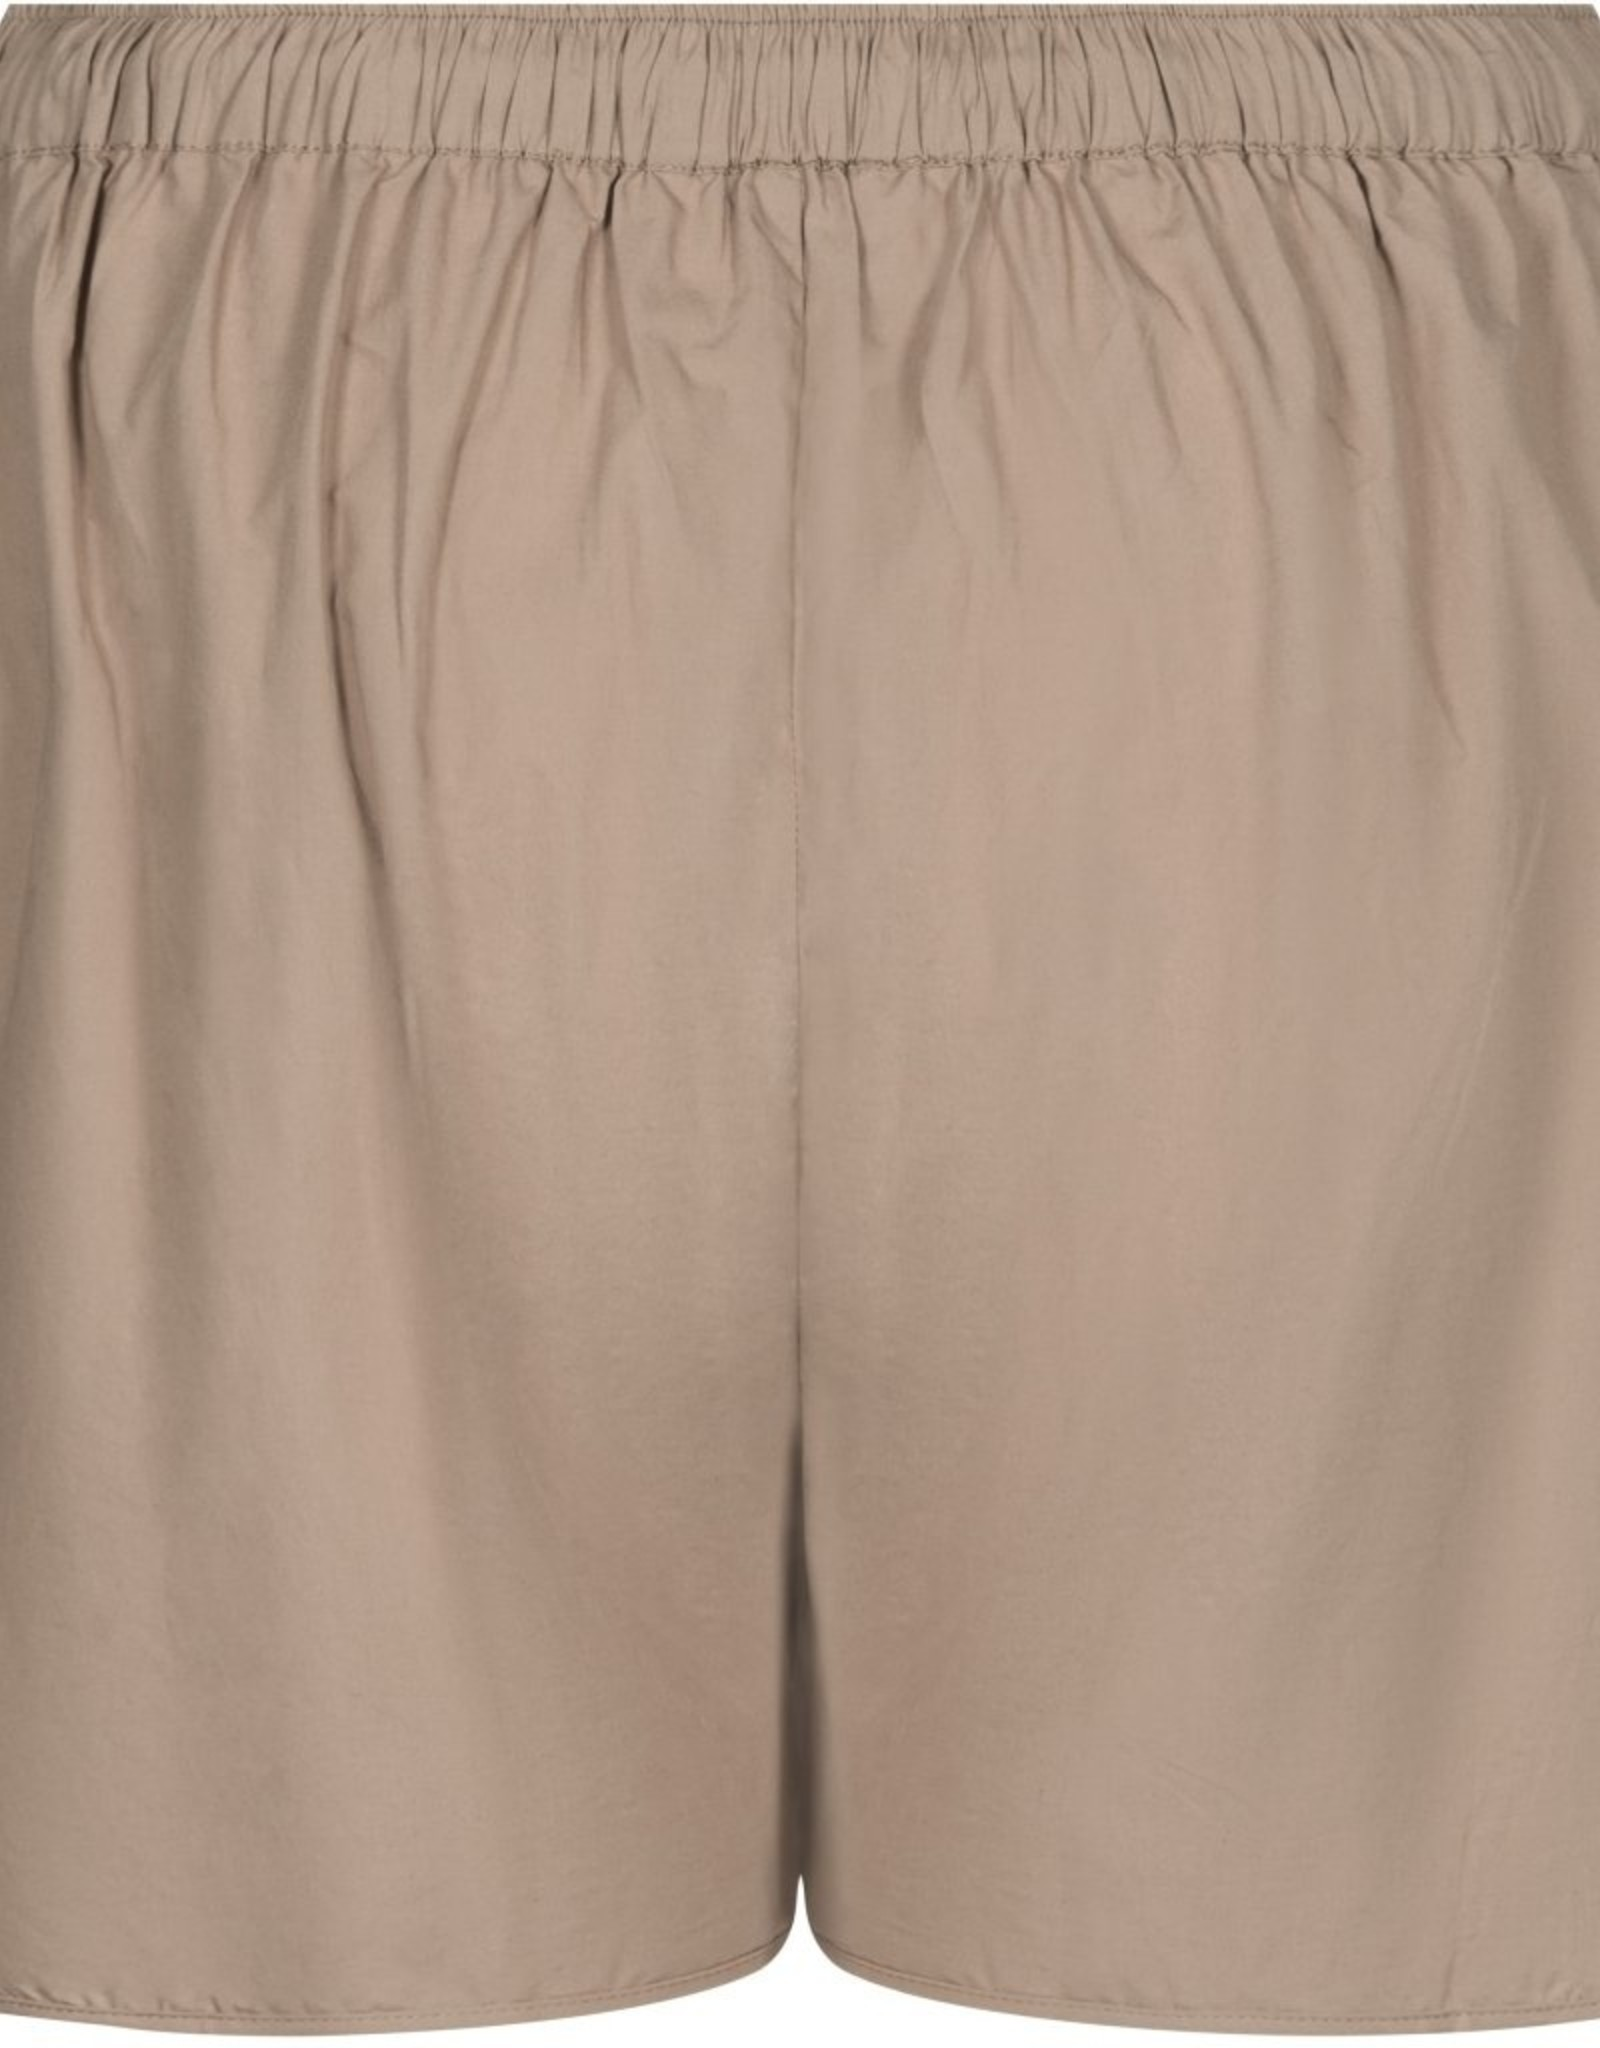 Gai&Lisva short 'Gunvor' organic cotton - hazy brown